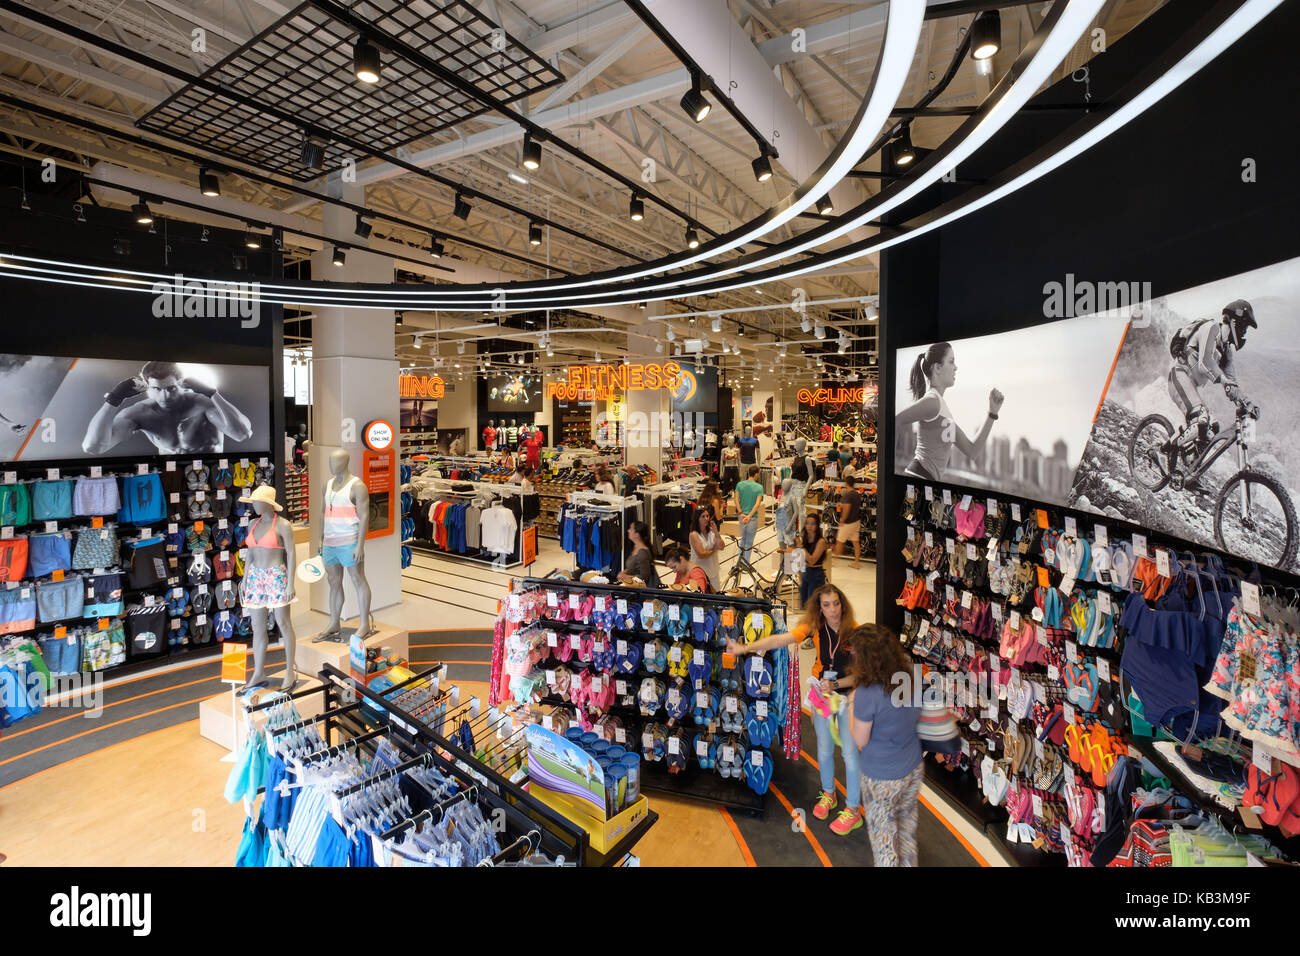 Sports Goods Store Interior Stock Photos & Sports Goods Store ...